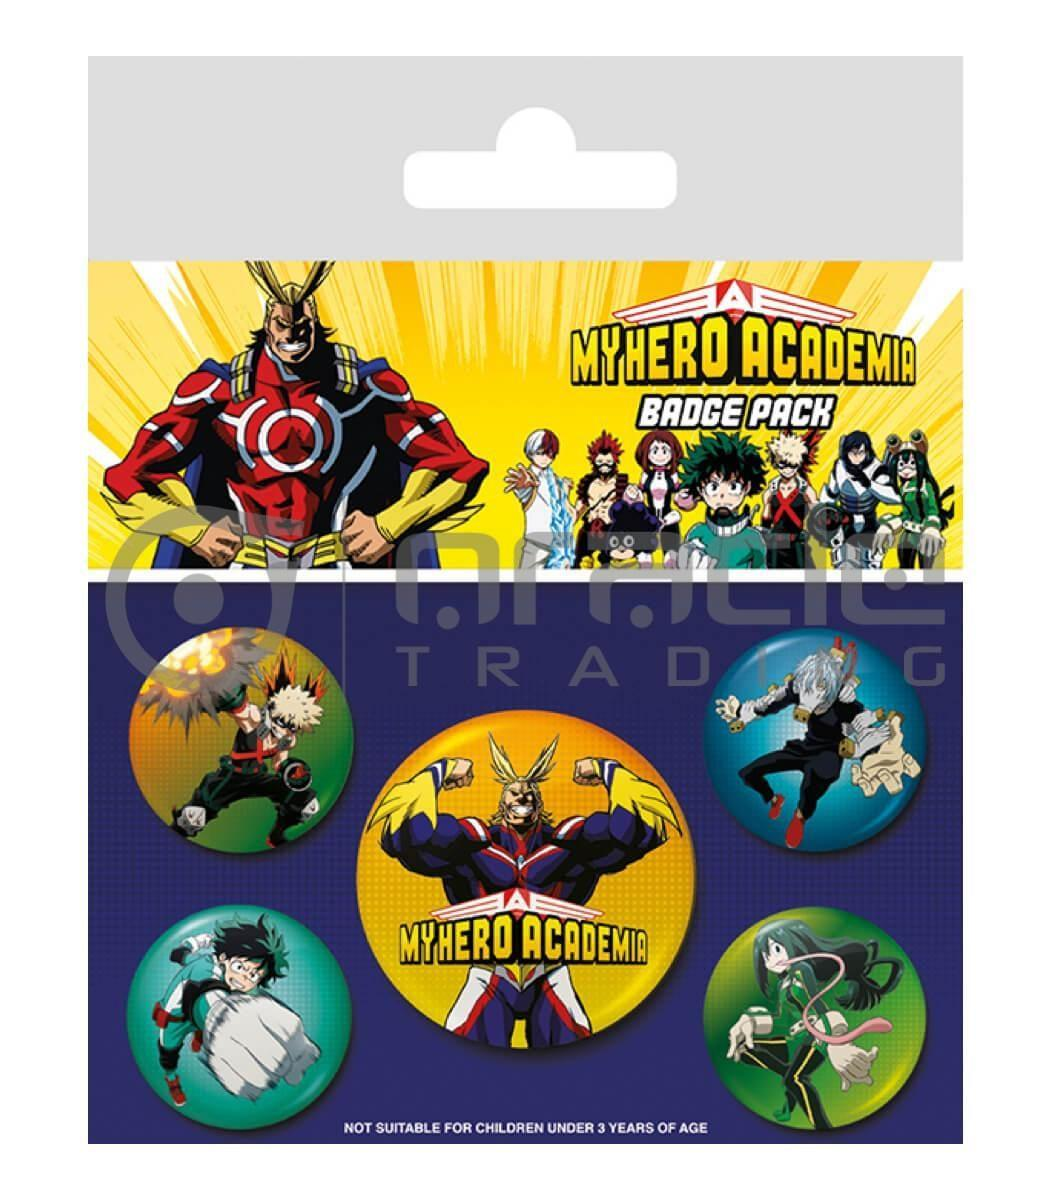 My Hero Academia Badge Pack